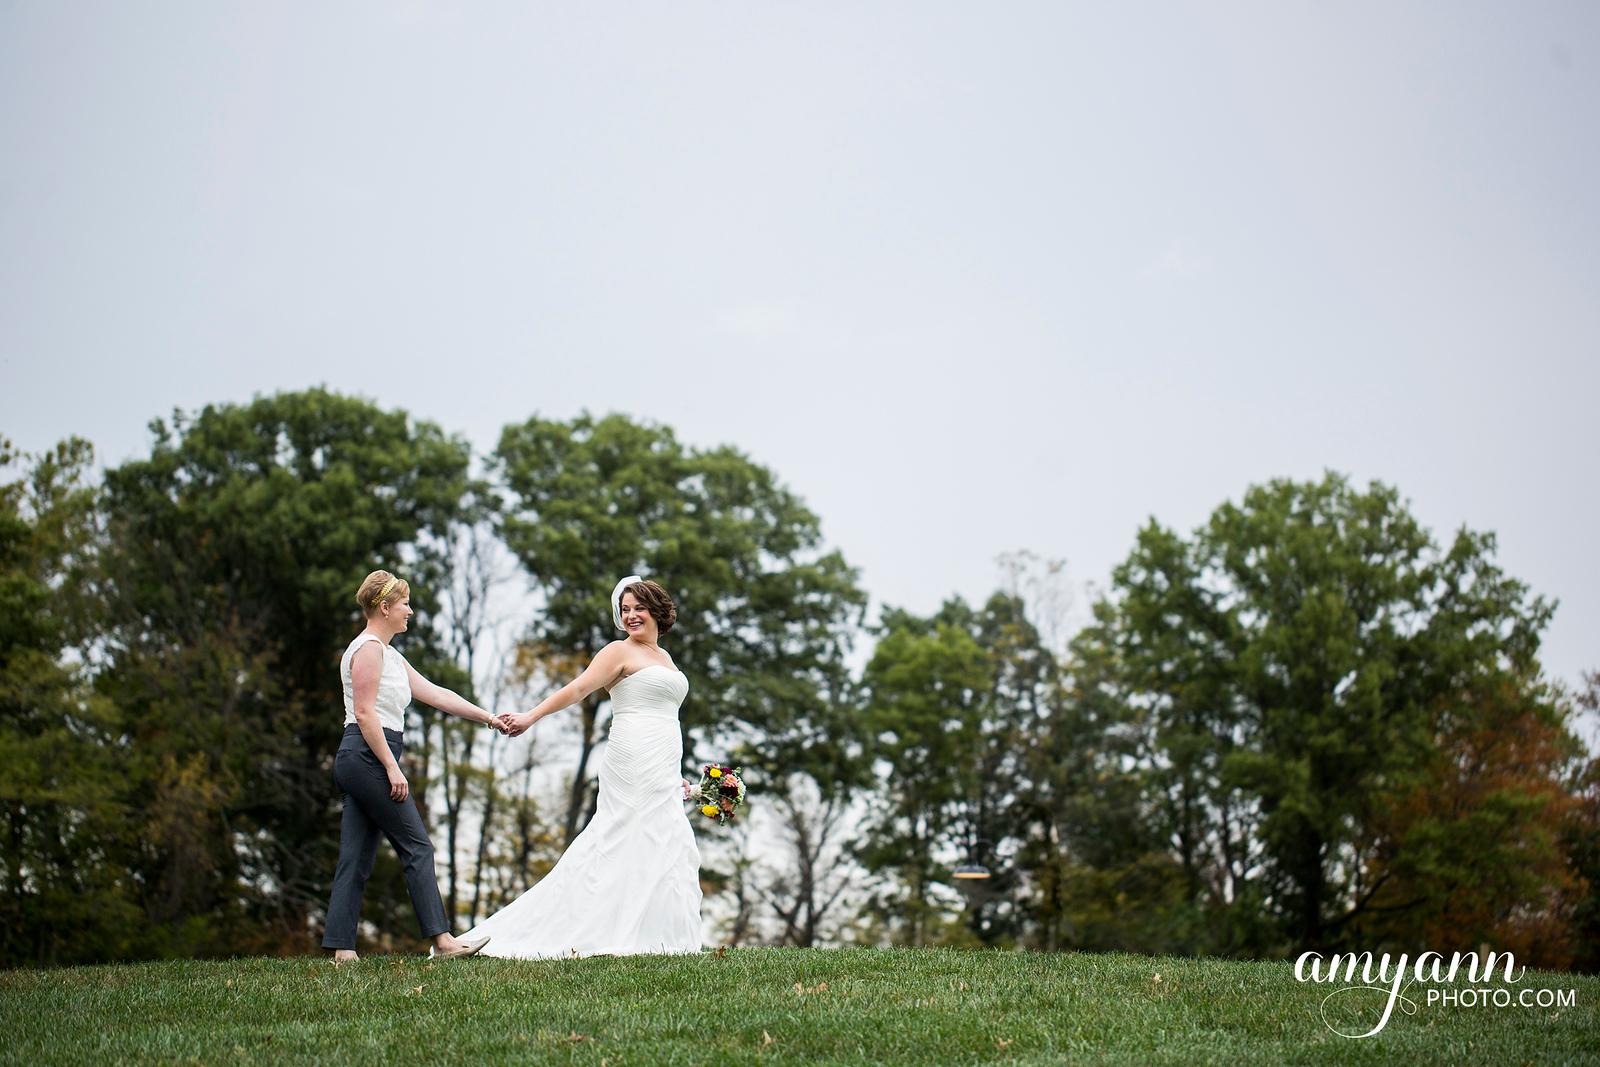 lindyangie_weddingblog41